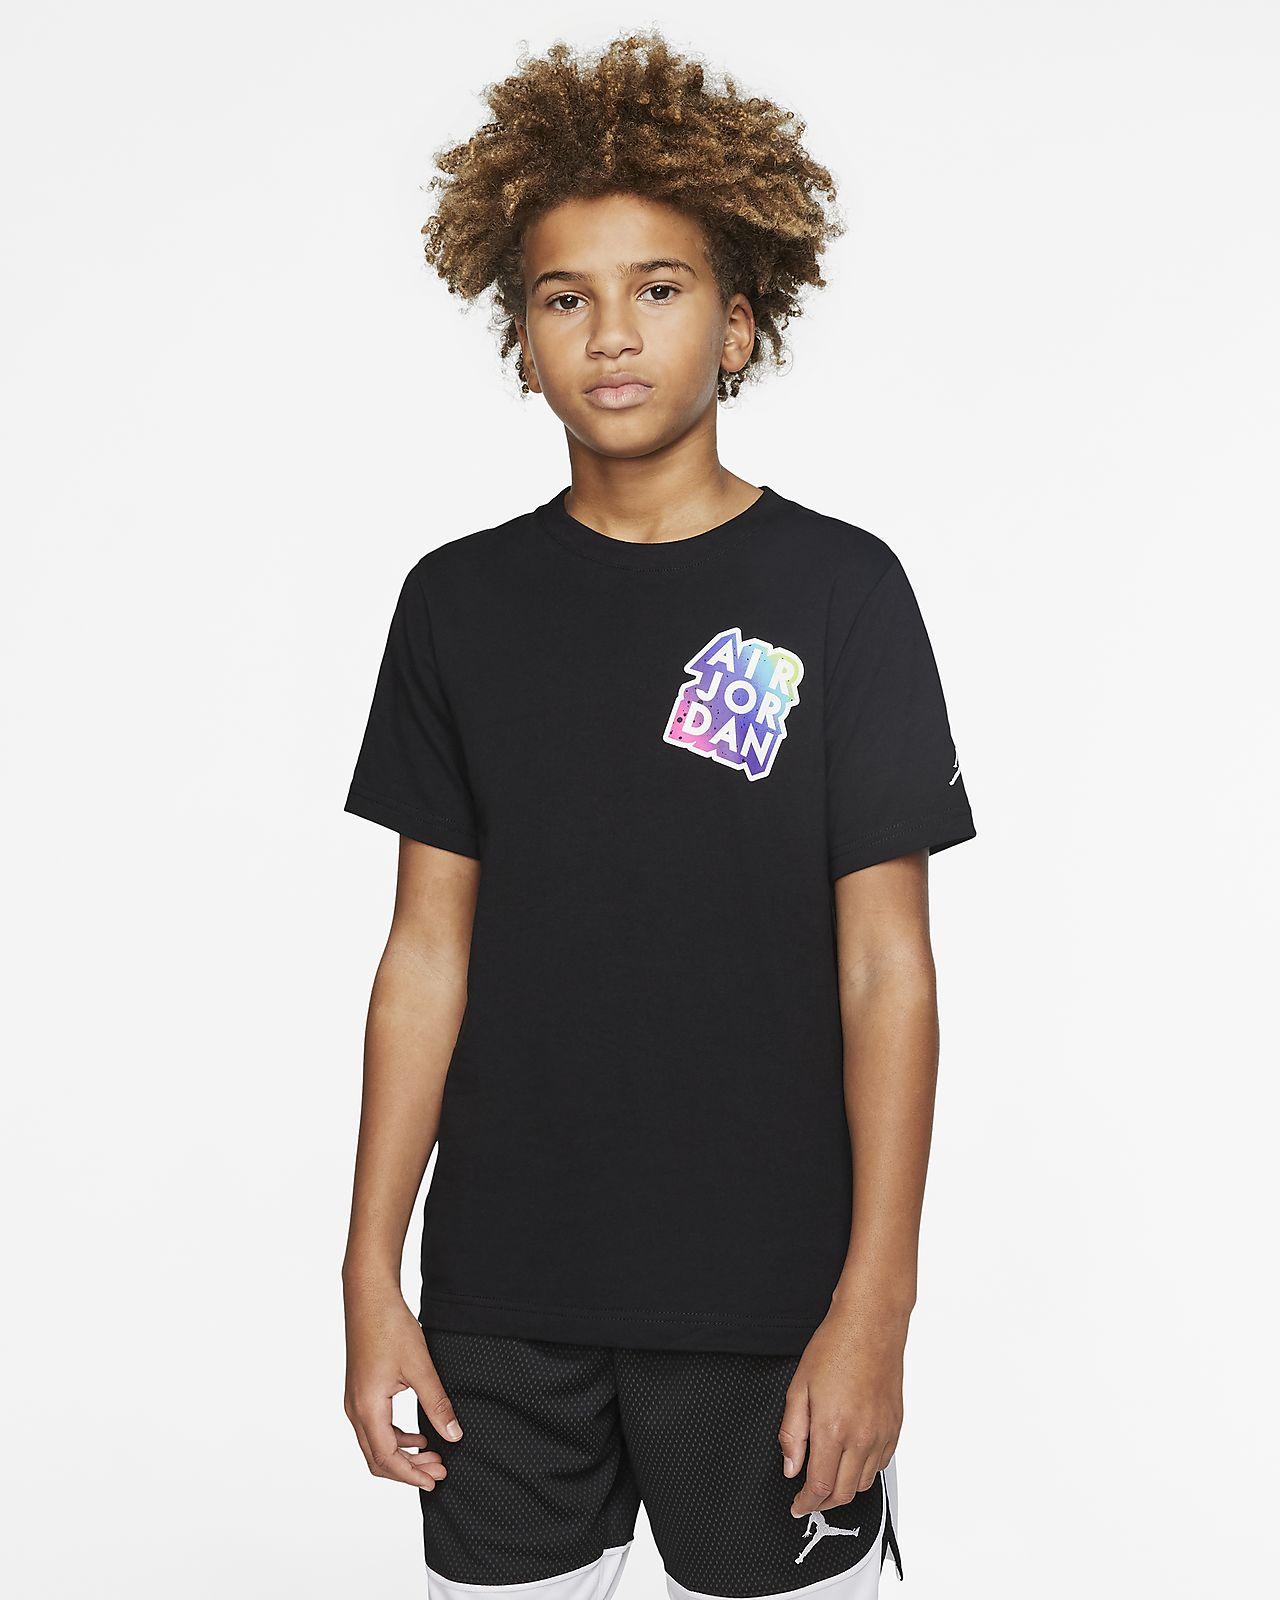 Air Jordan Camiseta de manga corta Niño